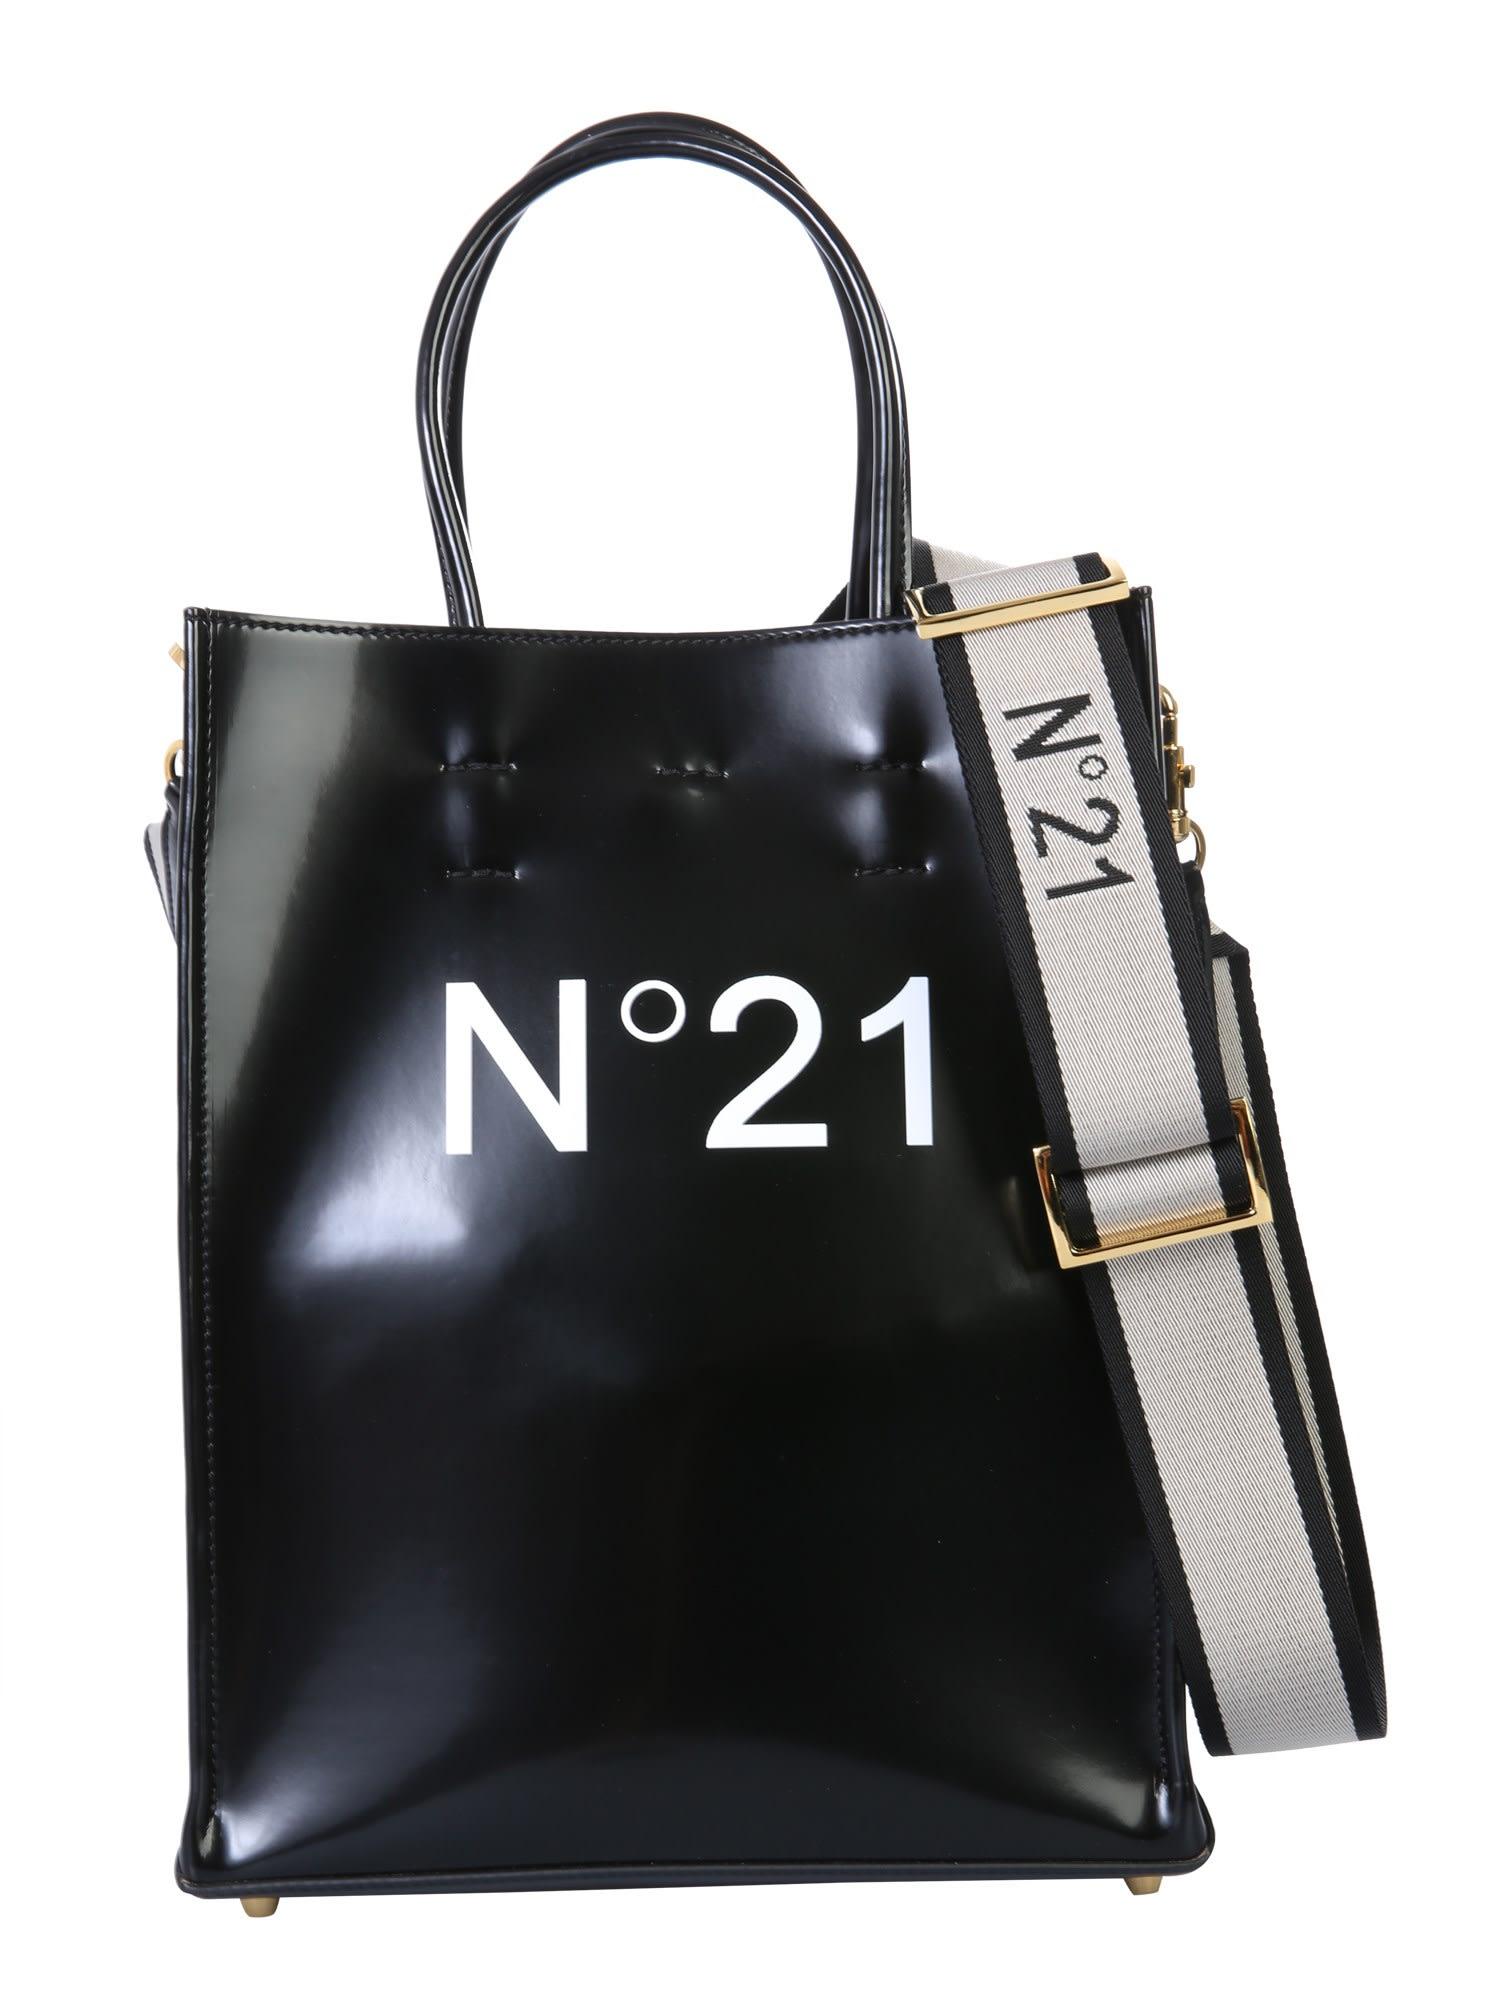 N°21 LOGO TOTE BAG